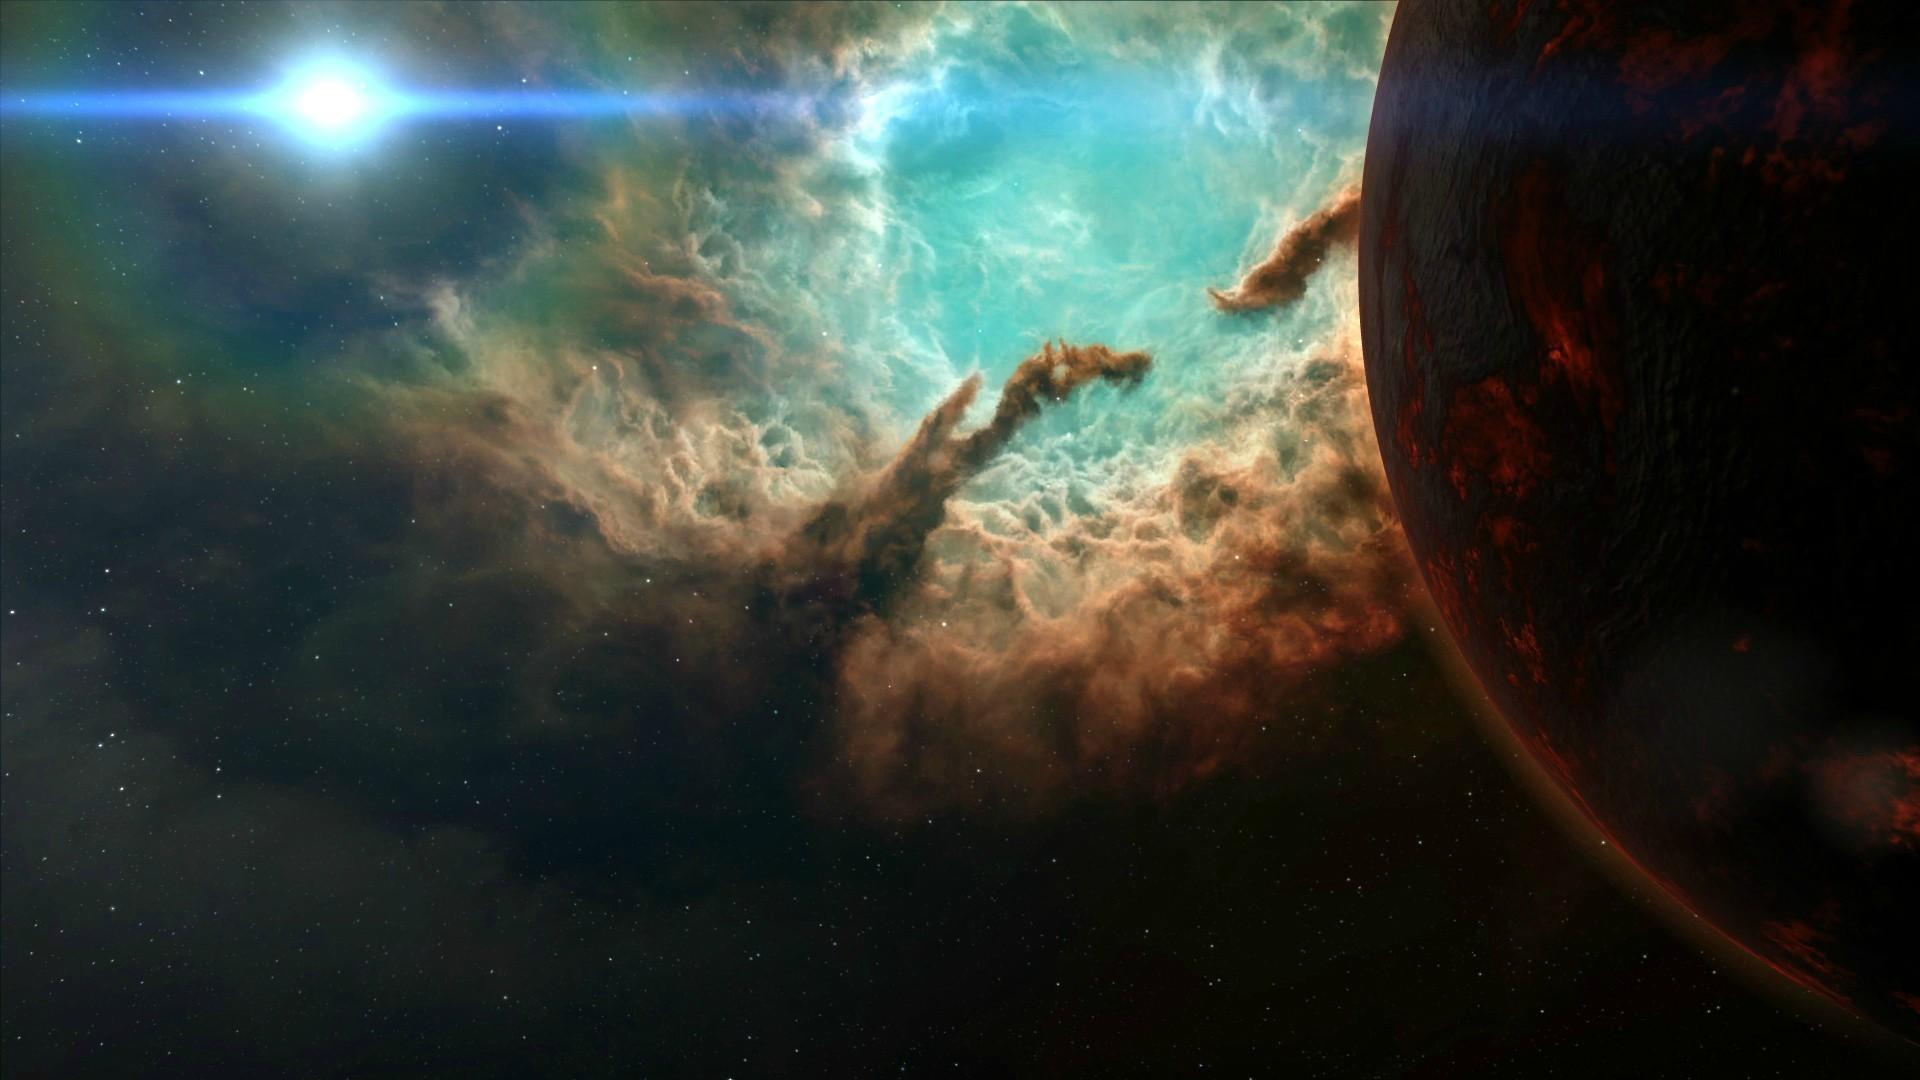 General 1920x1080 space nebula planet